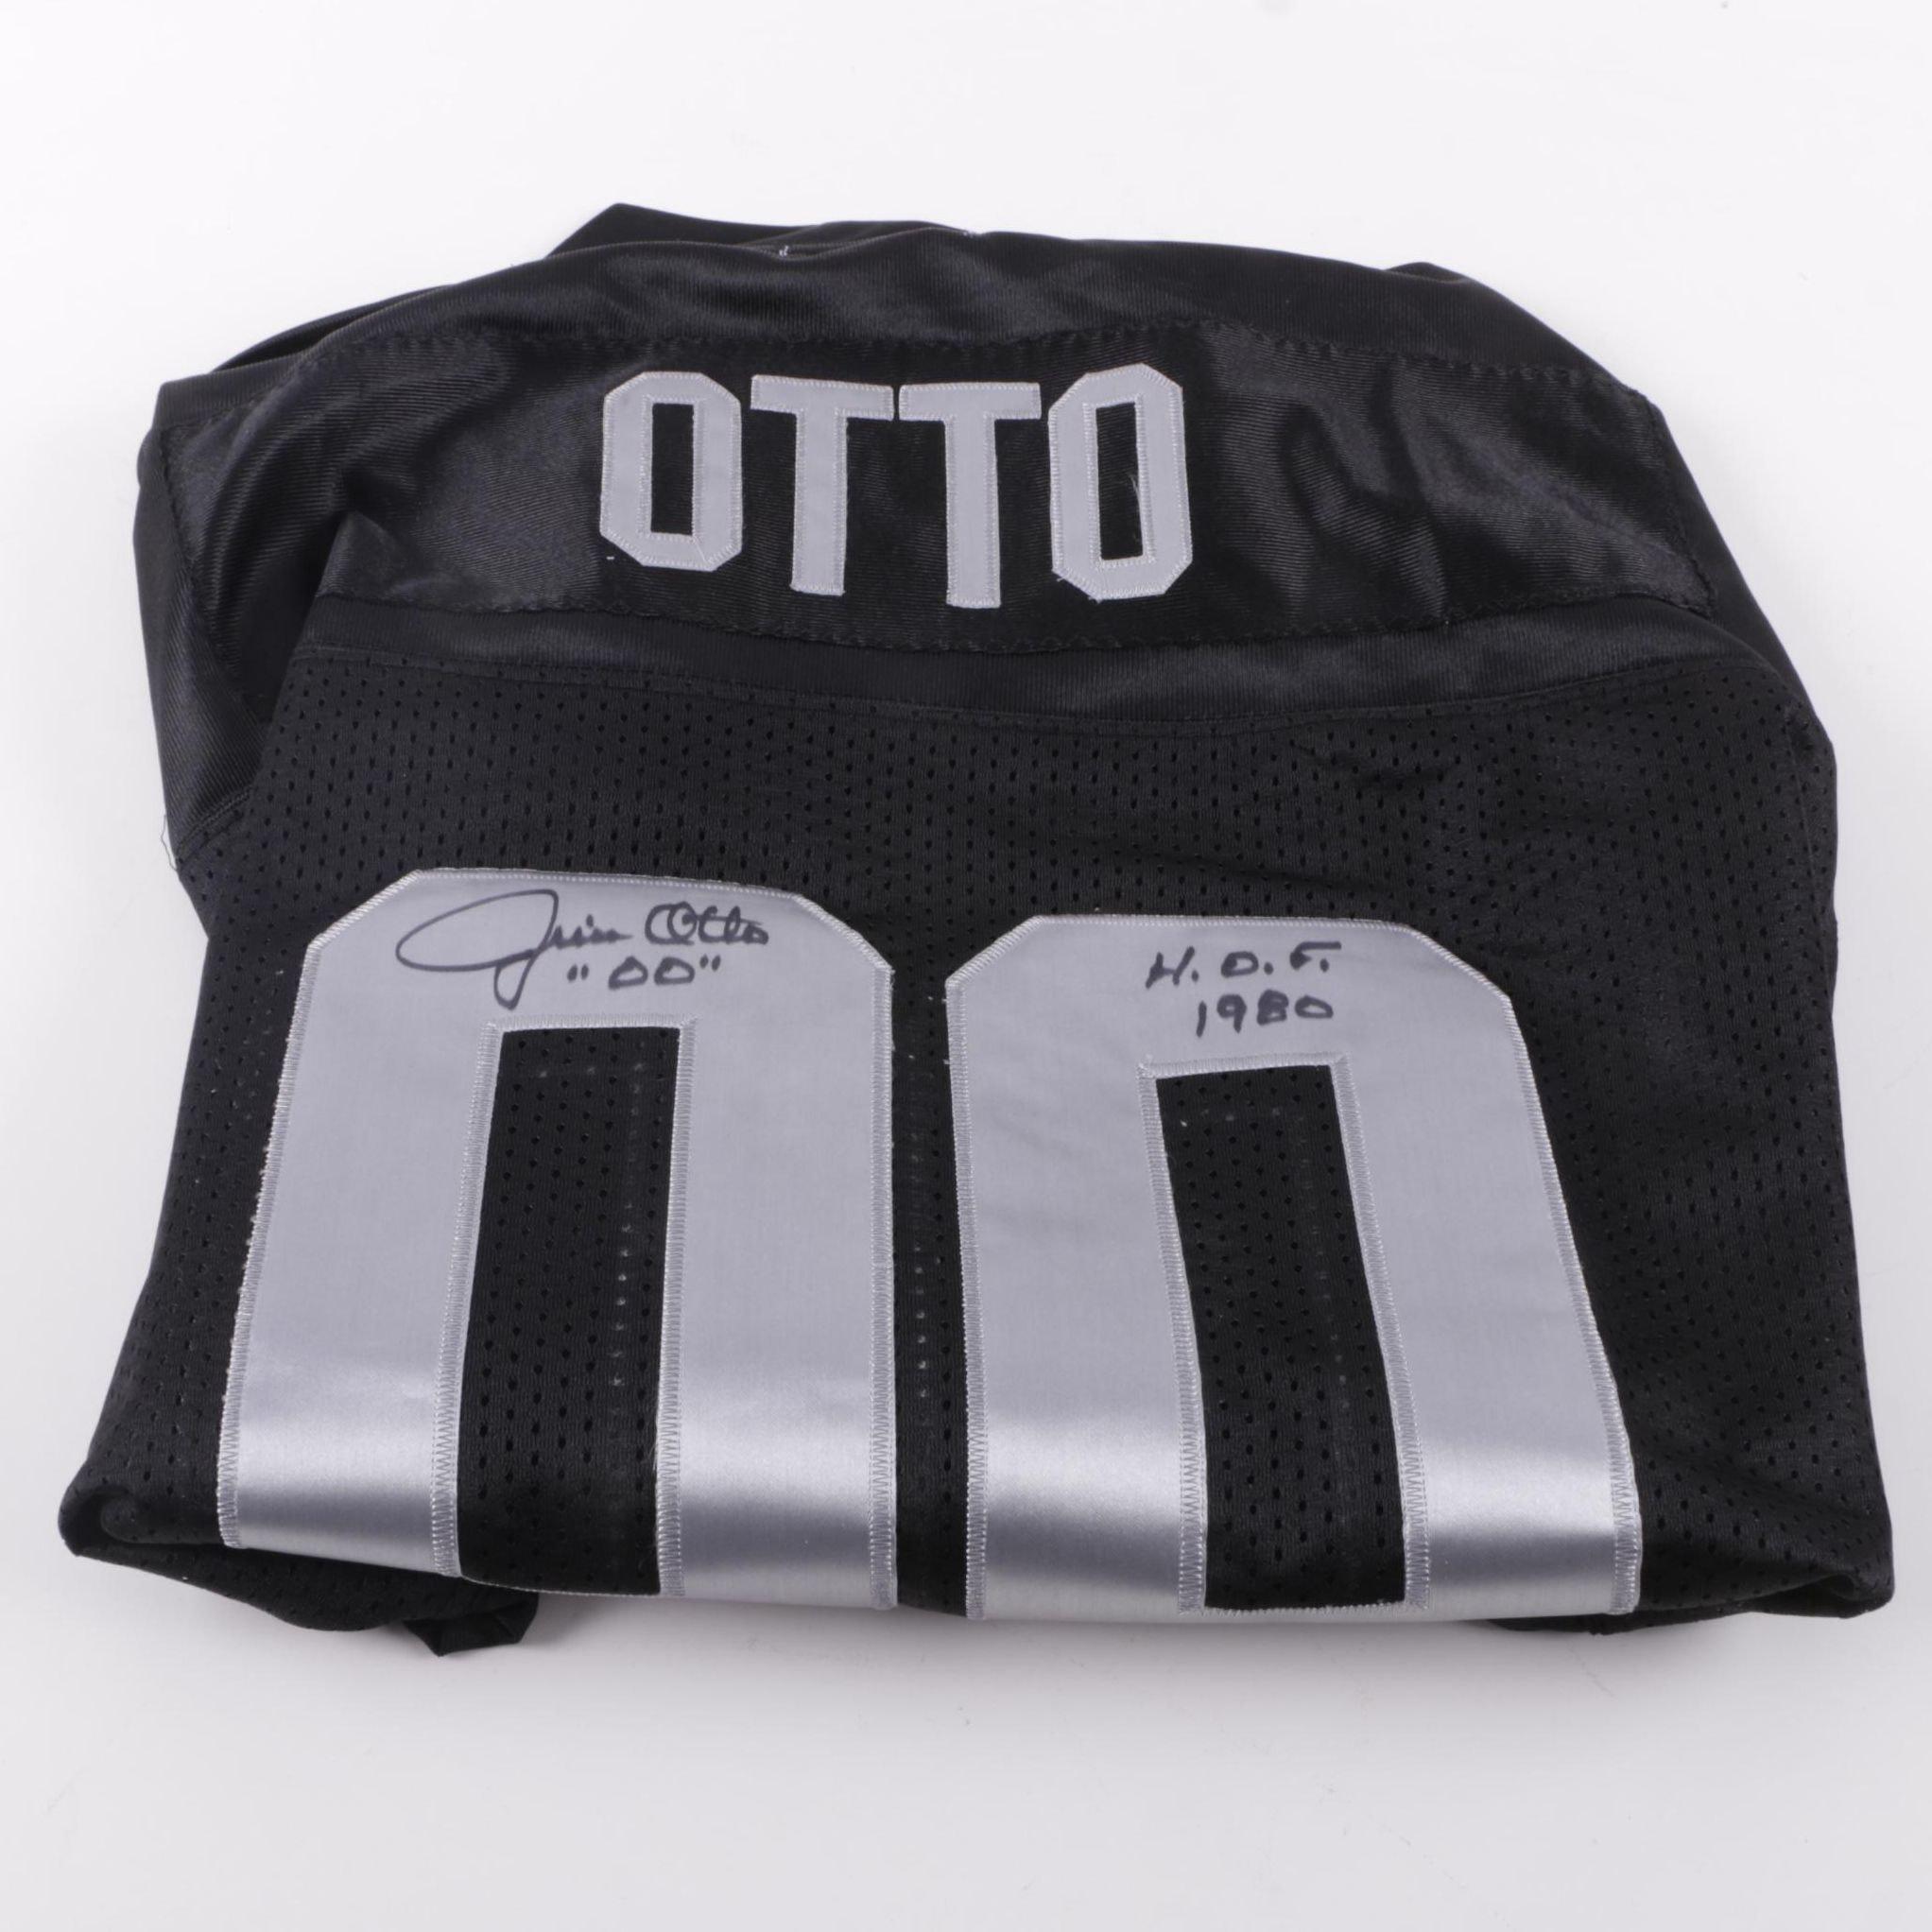 Jim Otto Signed Football Jersey